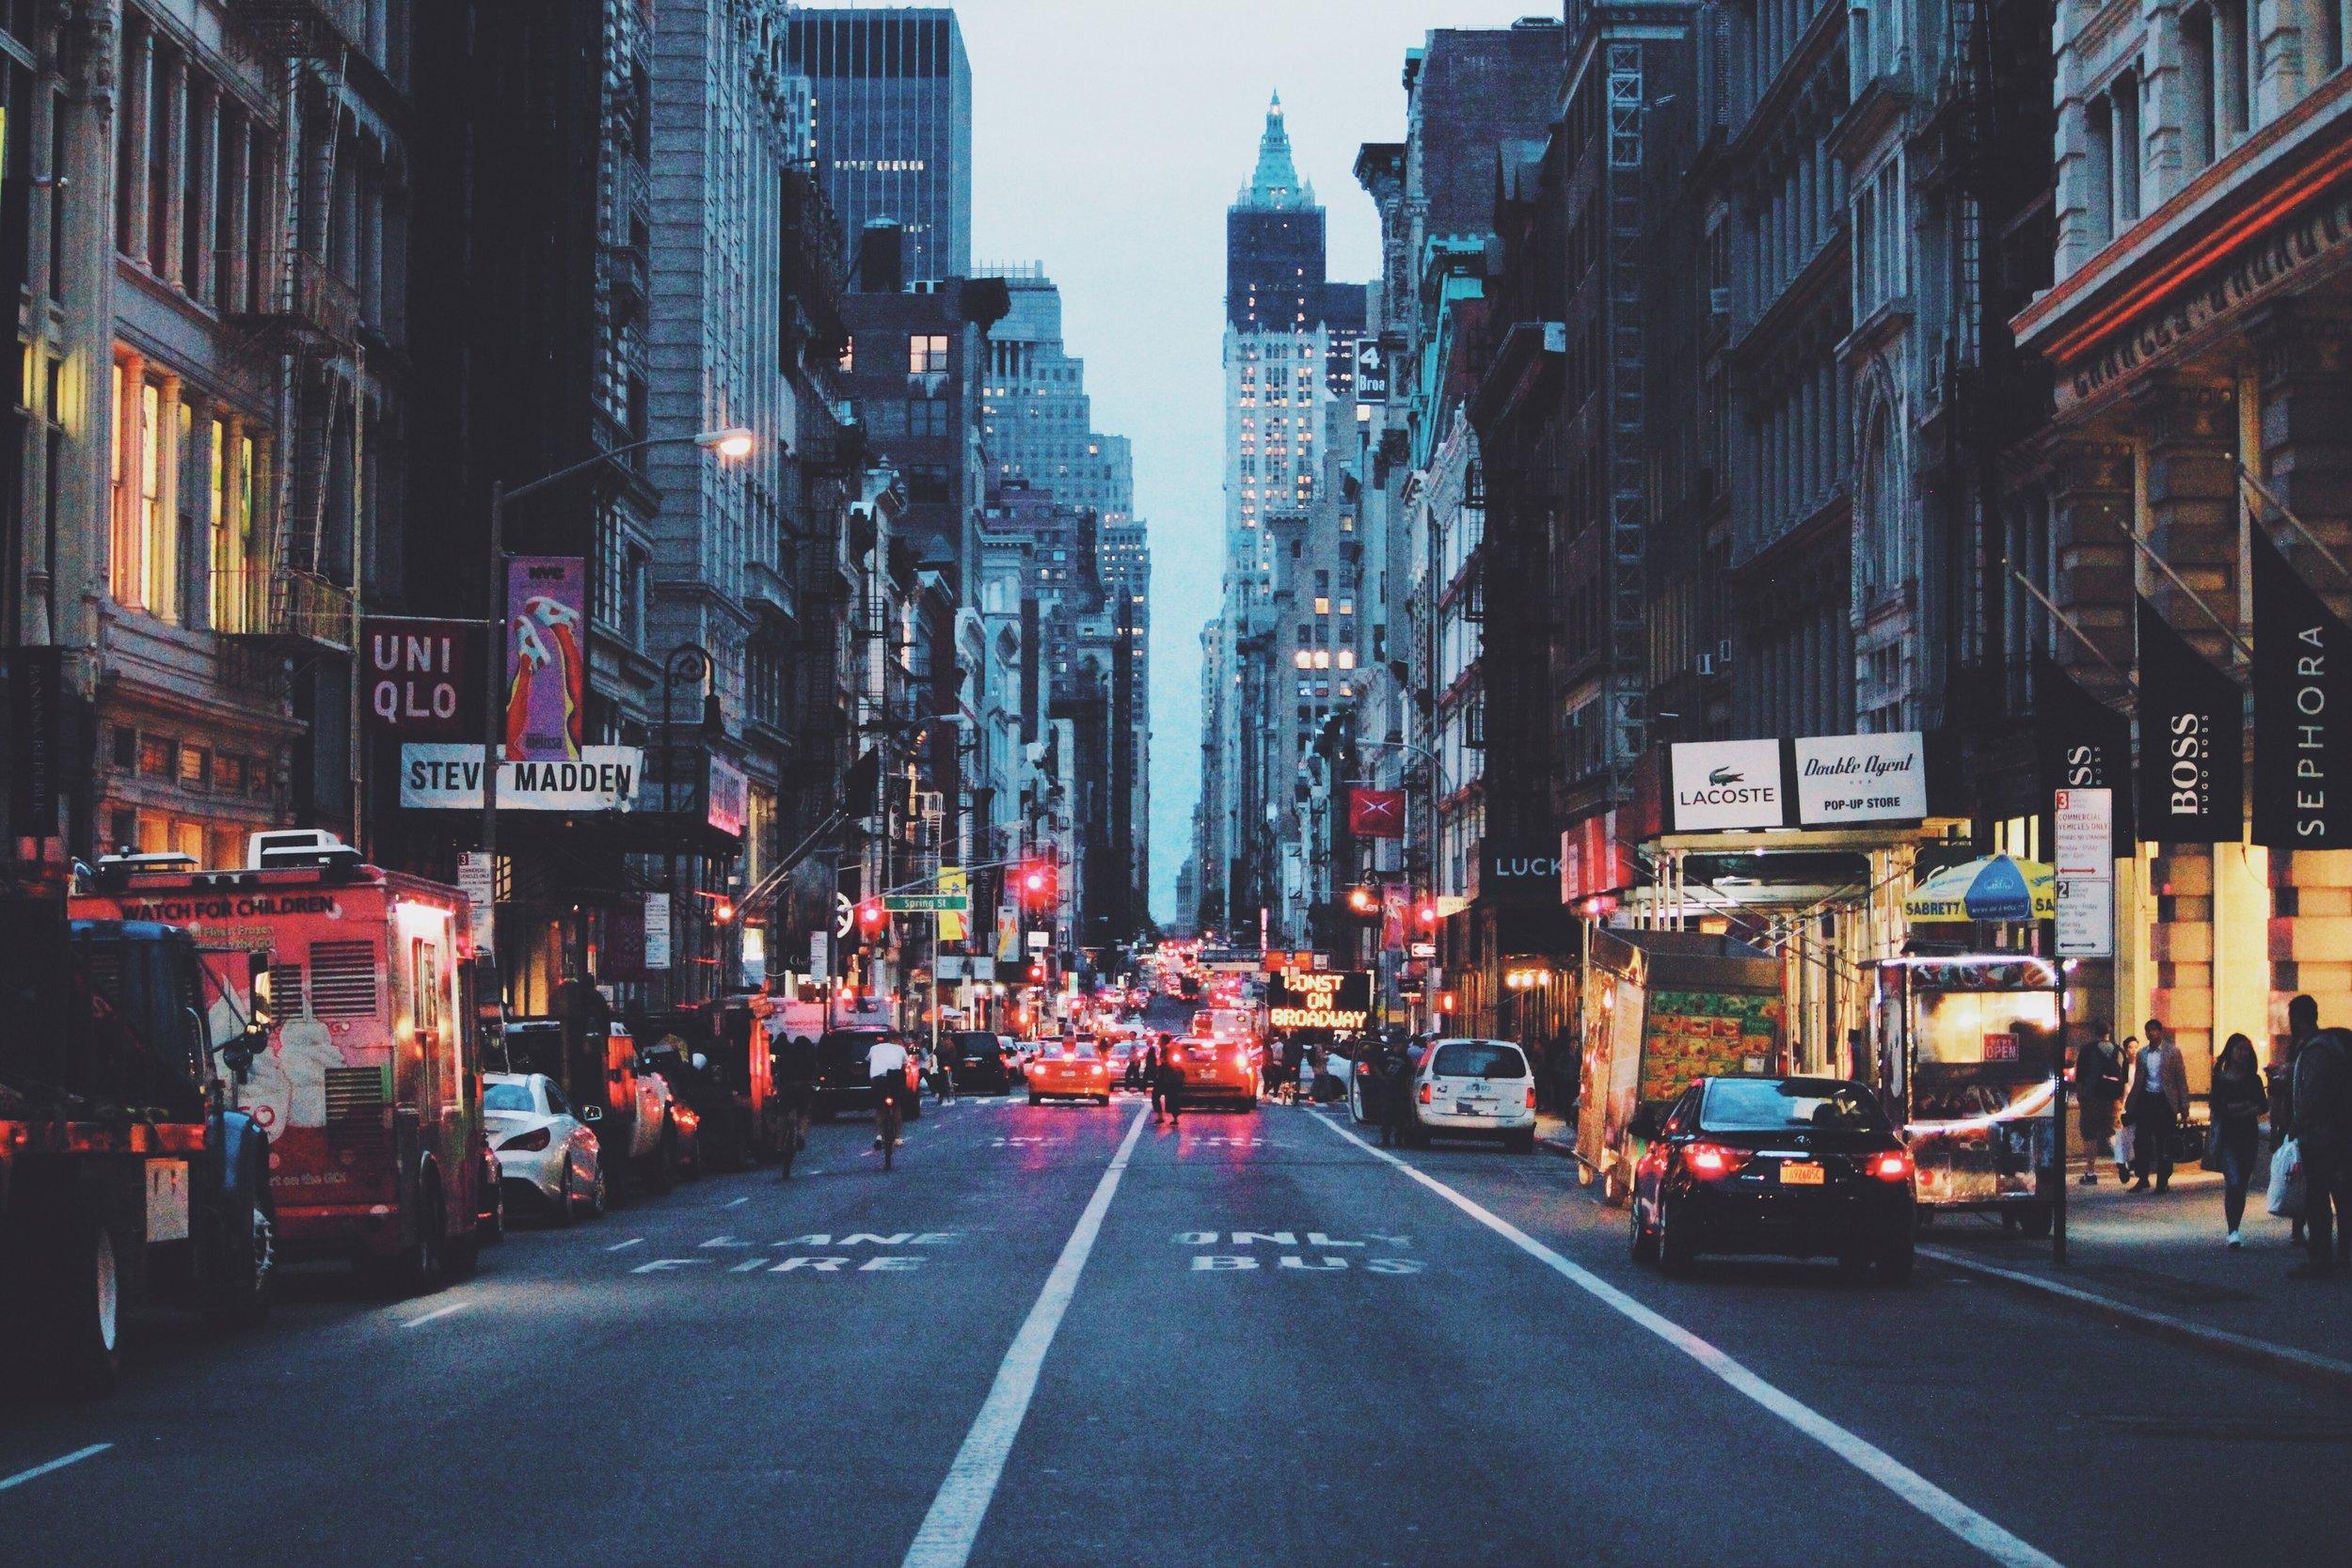 Soho - New York City.jpg